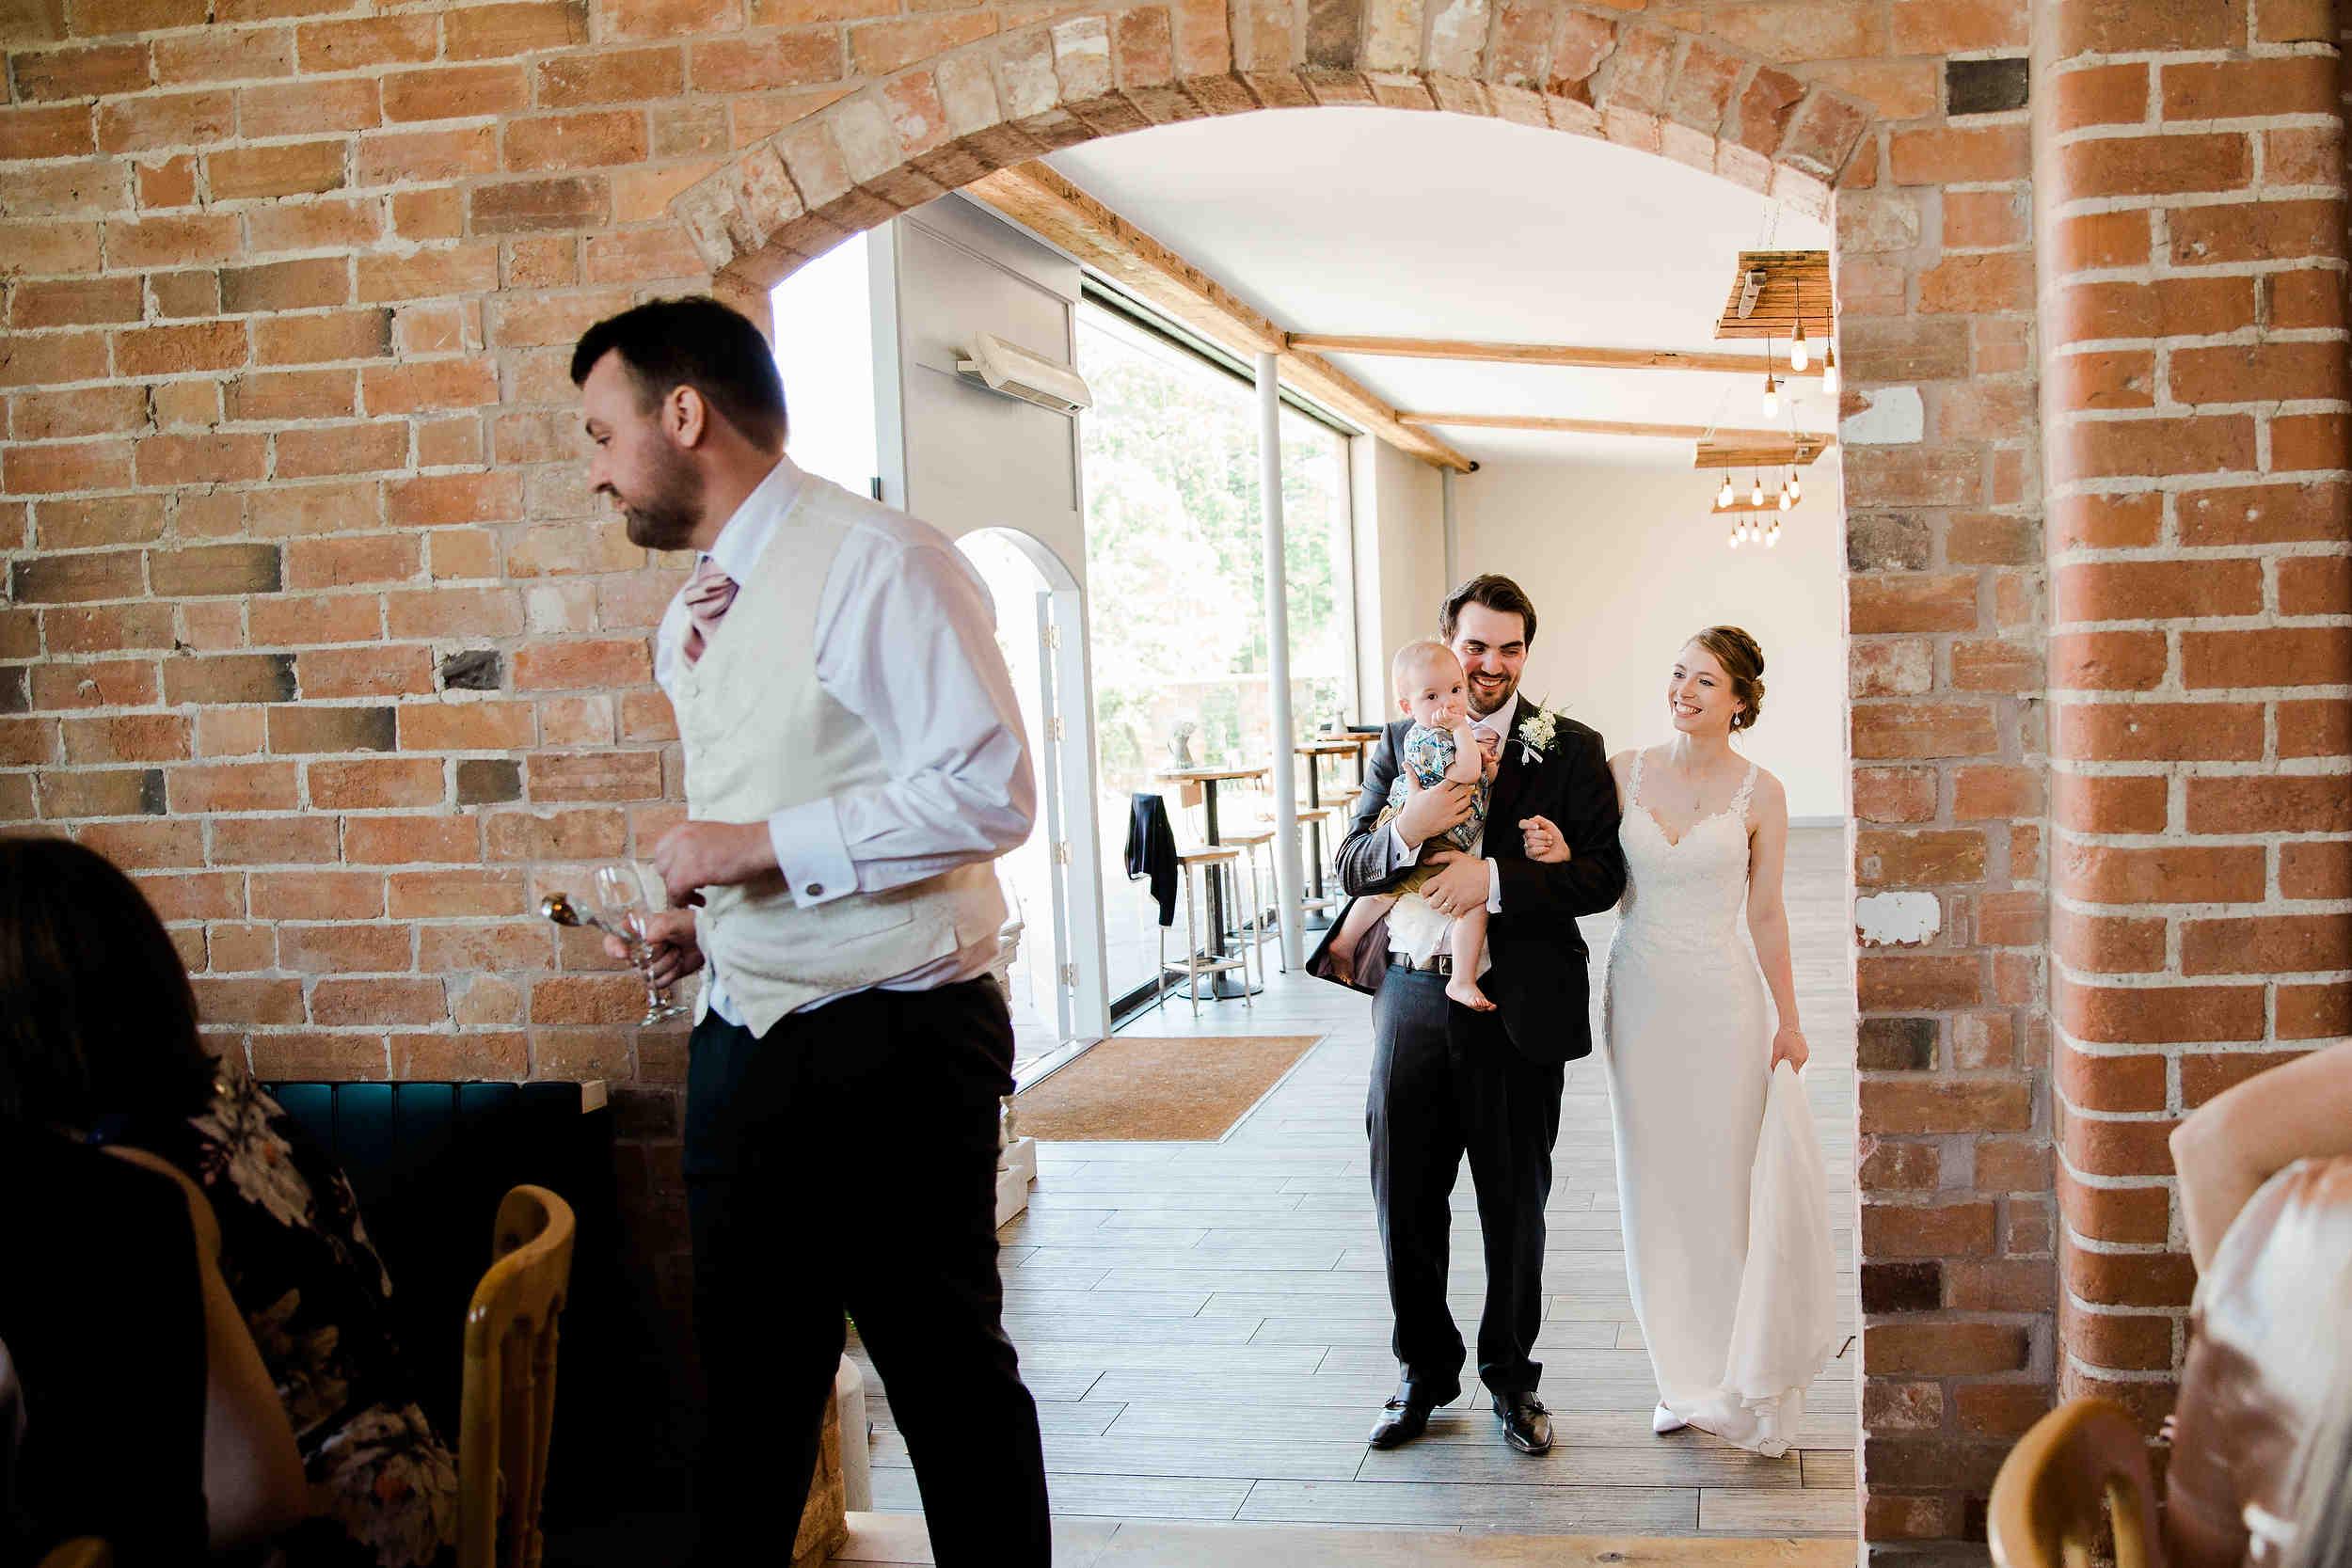 Modern_Stylish_Wedding_at_Swallows_Nest_Barn1242